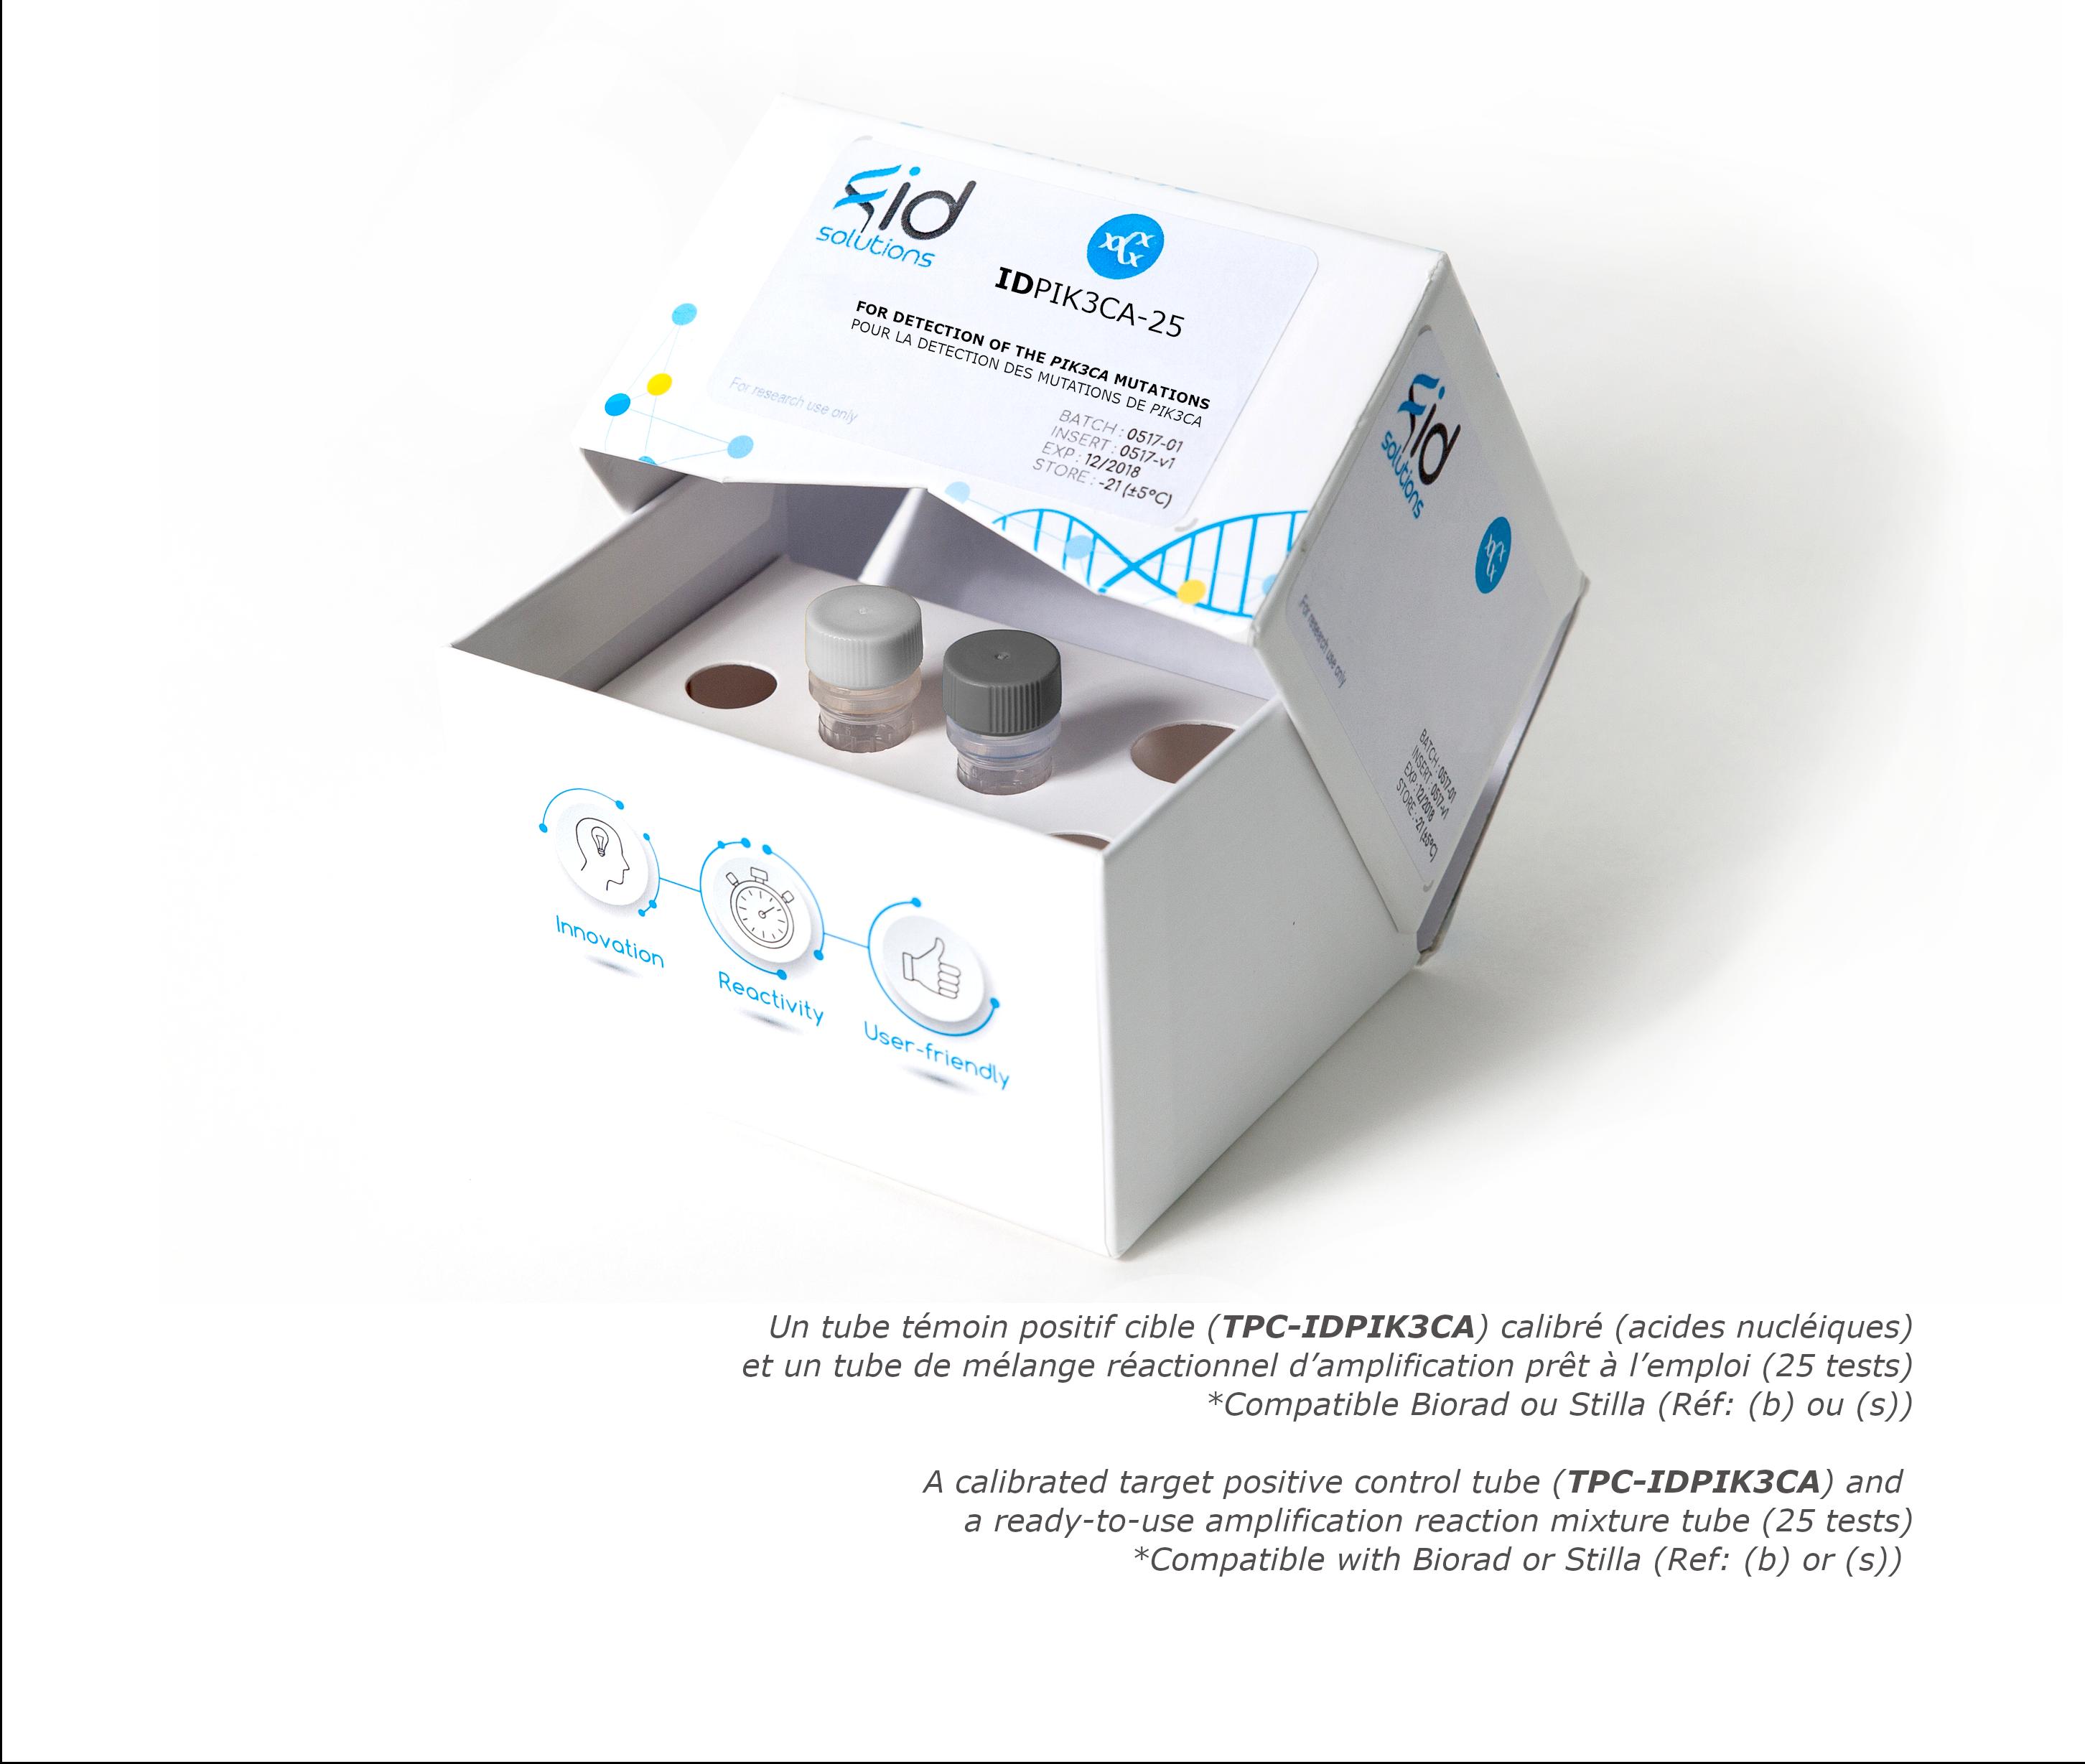 IDPIK3CA - Circulating tumor DNA PIK3CA Mutation Detection Kit based on digital PCR